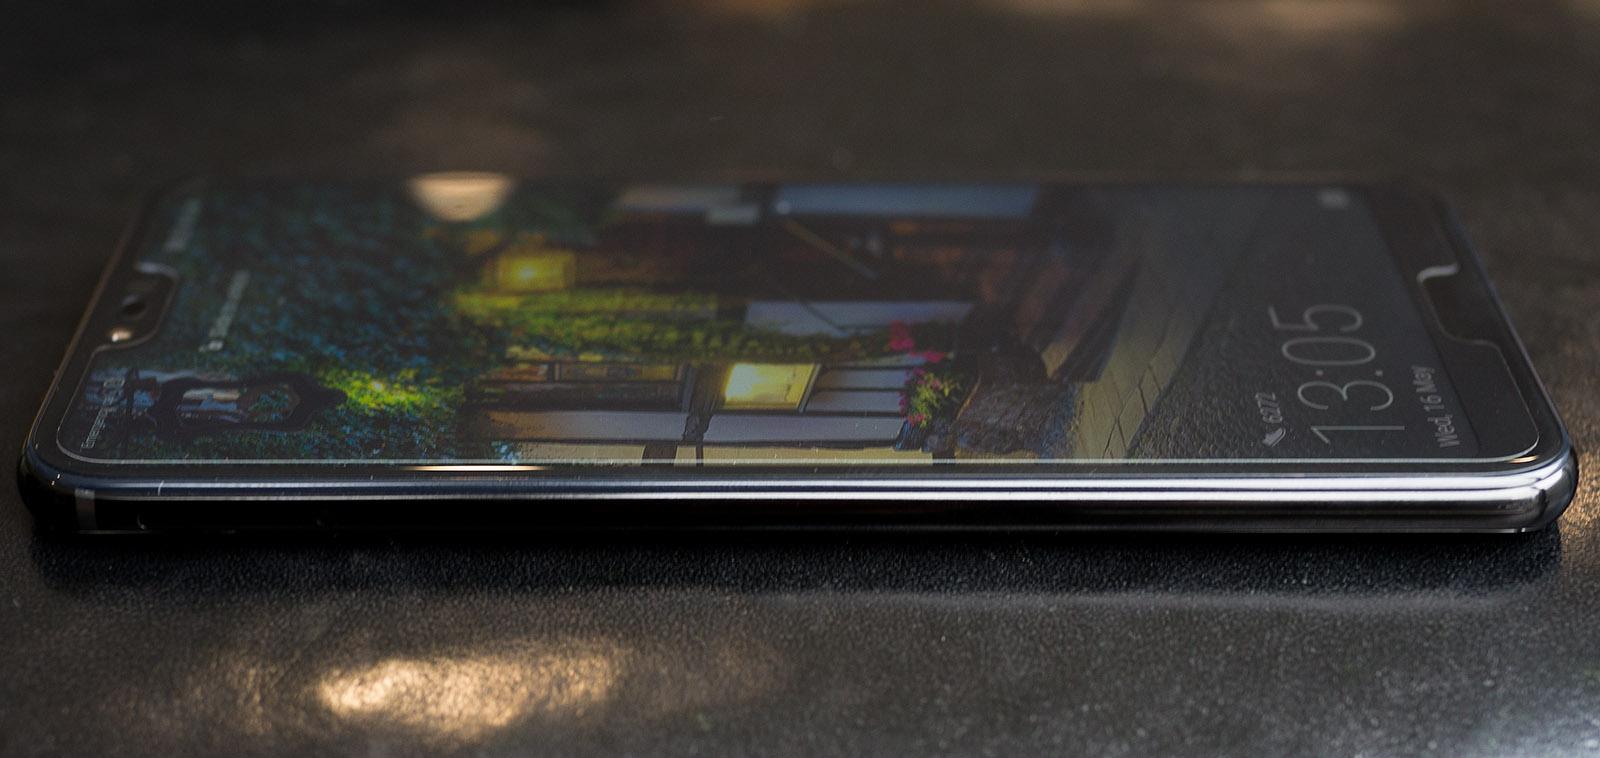 Как фотографирует новый Honor 10. Сравниваем с Huawei P20 и iPhone 7 Plus - 26